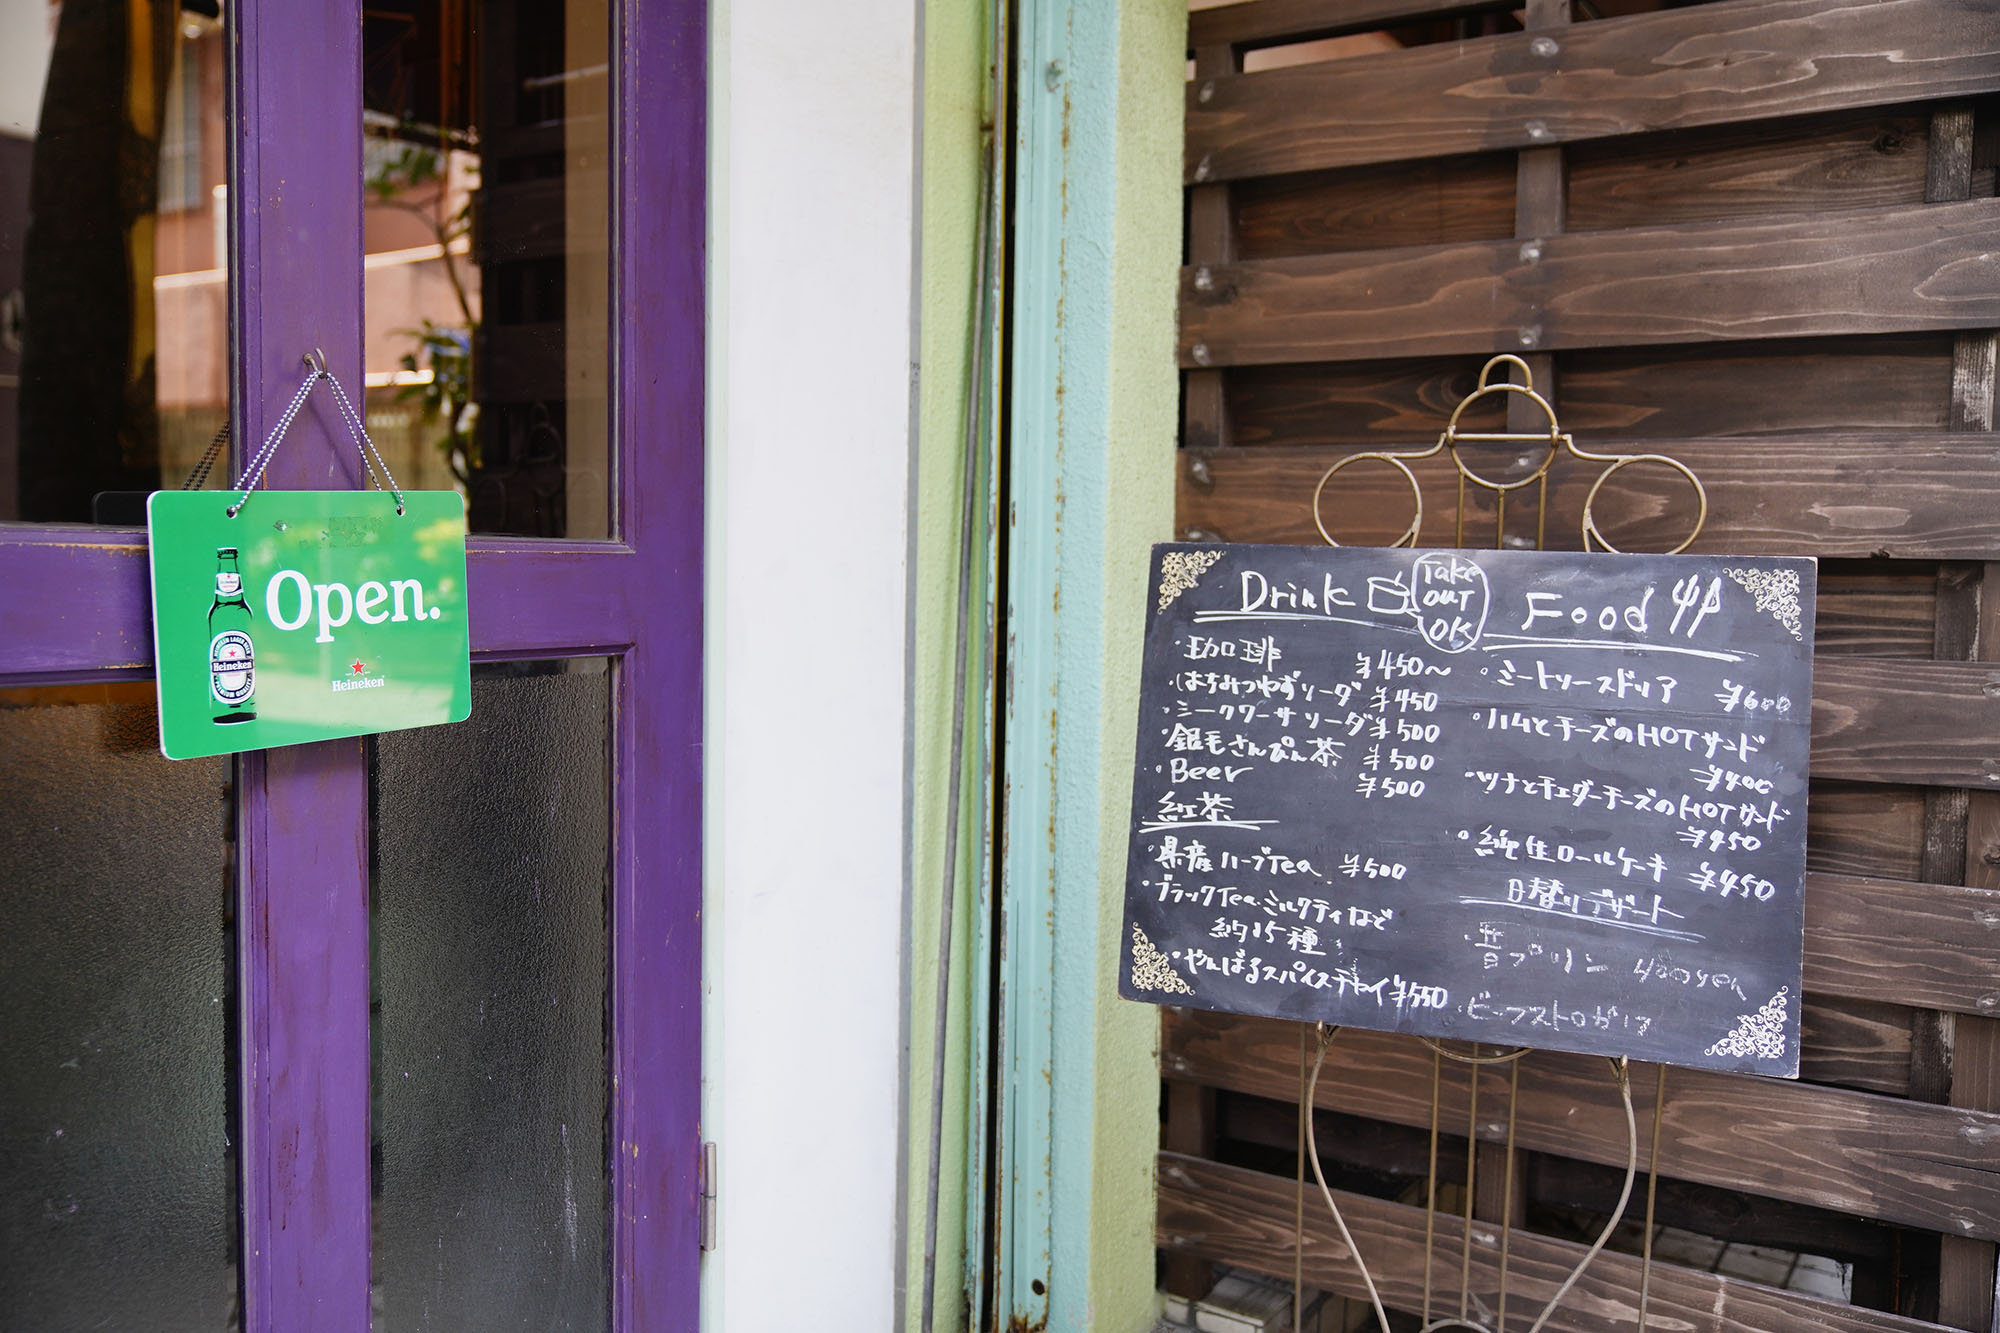 「Cafe プラヌラ」戌亥近江さん / 那覇市壺屋 浮島通り|このまちで生きる人 インタビュー